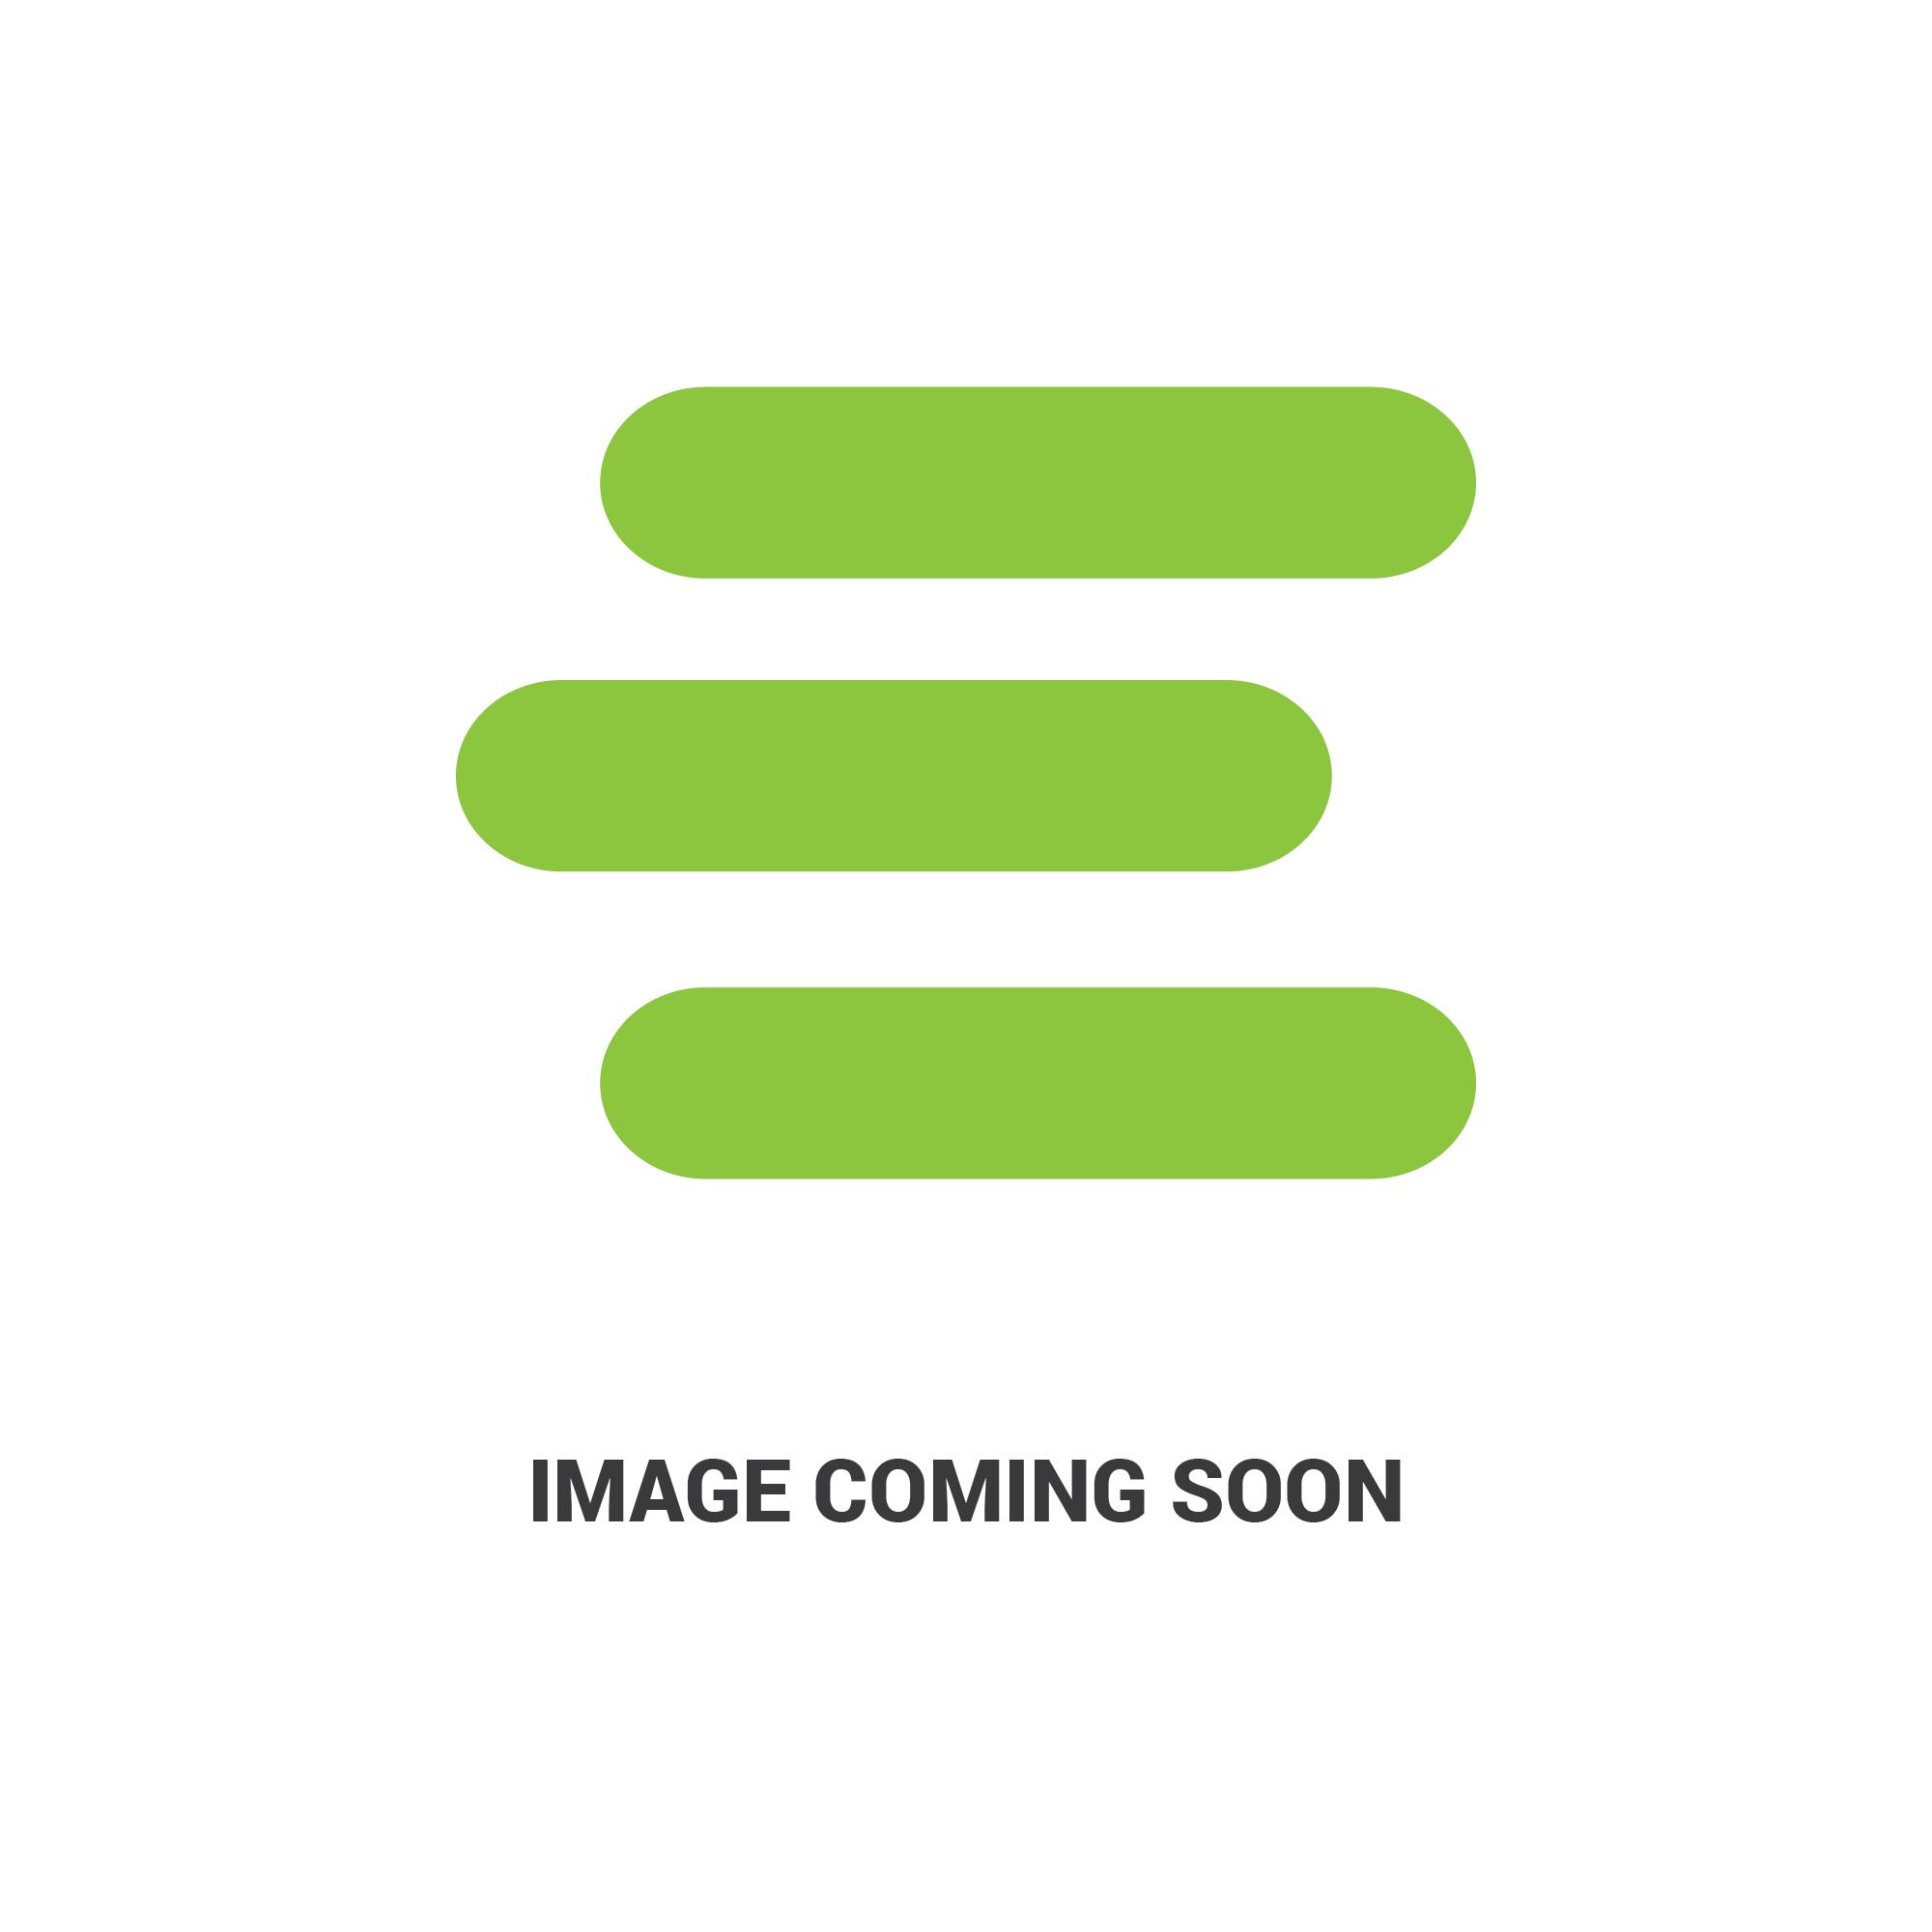 E-15241-320901968_1.jpg